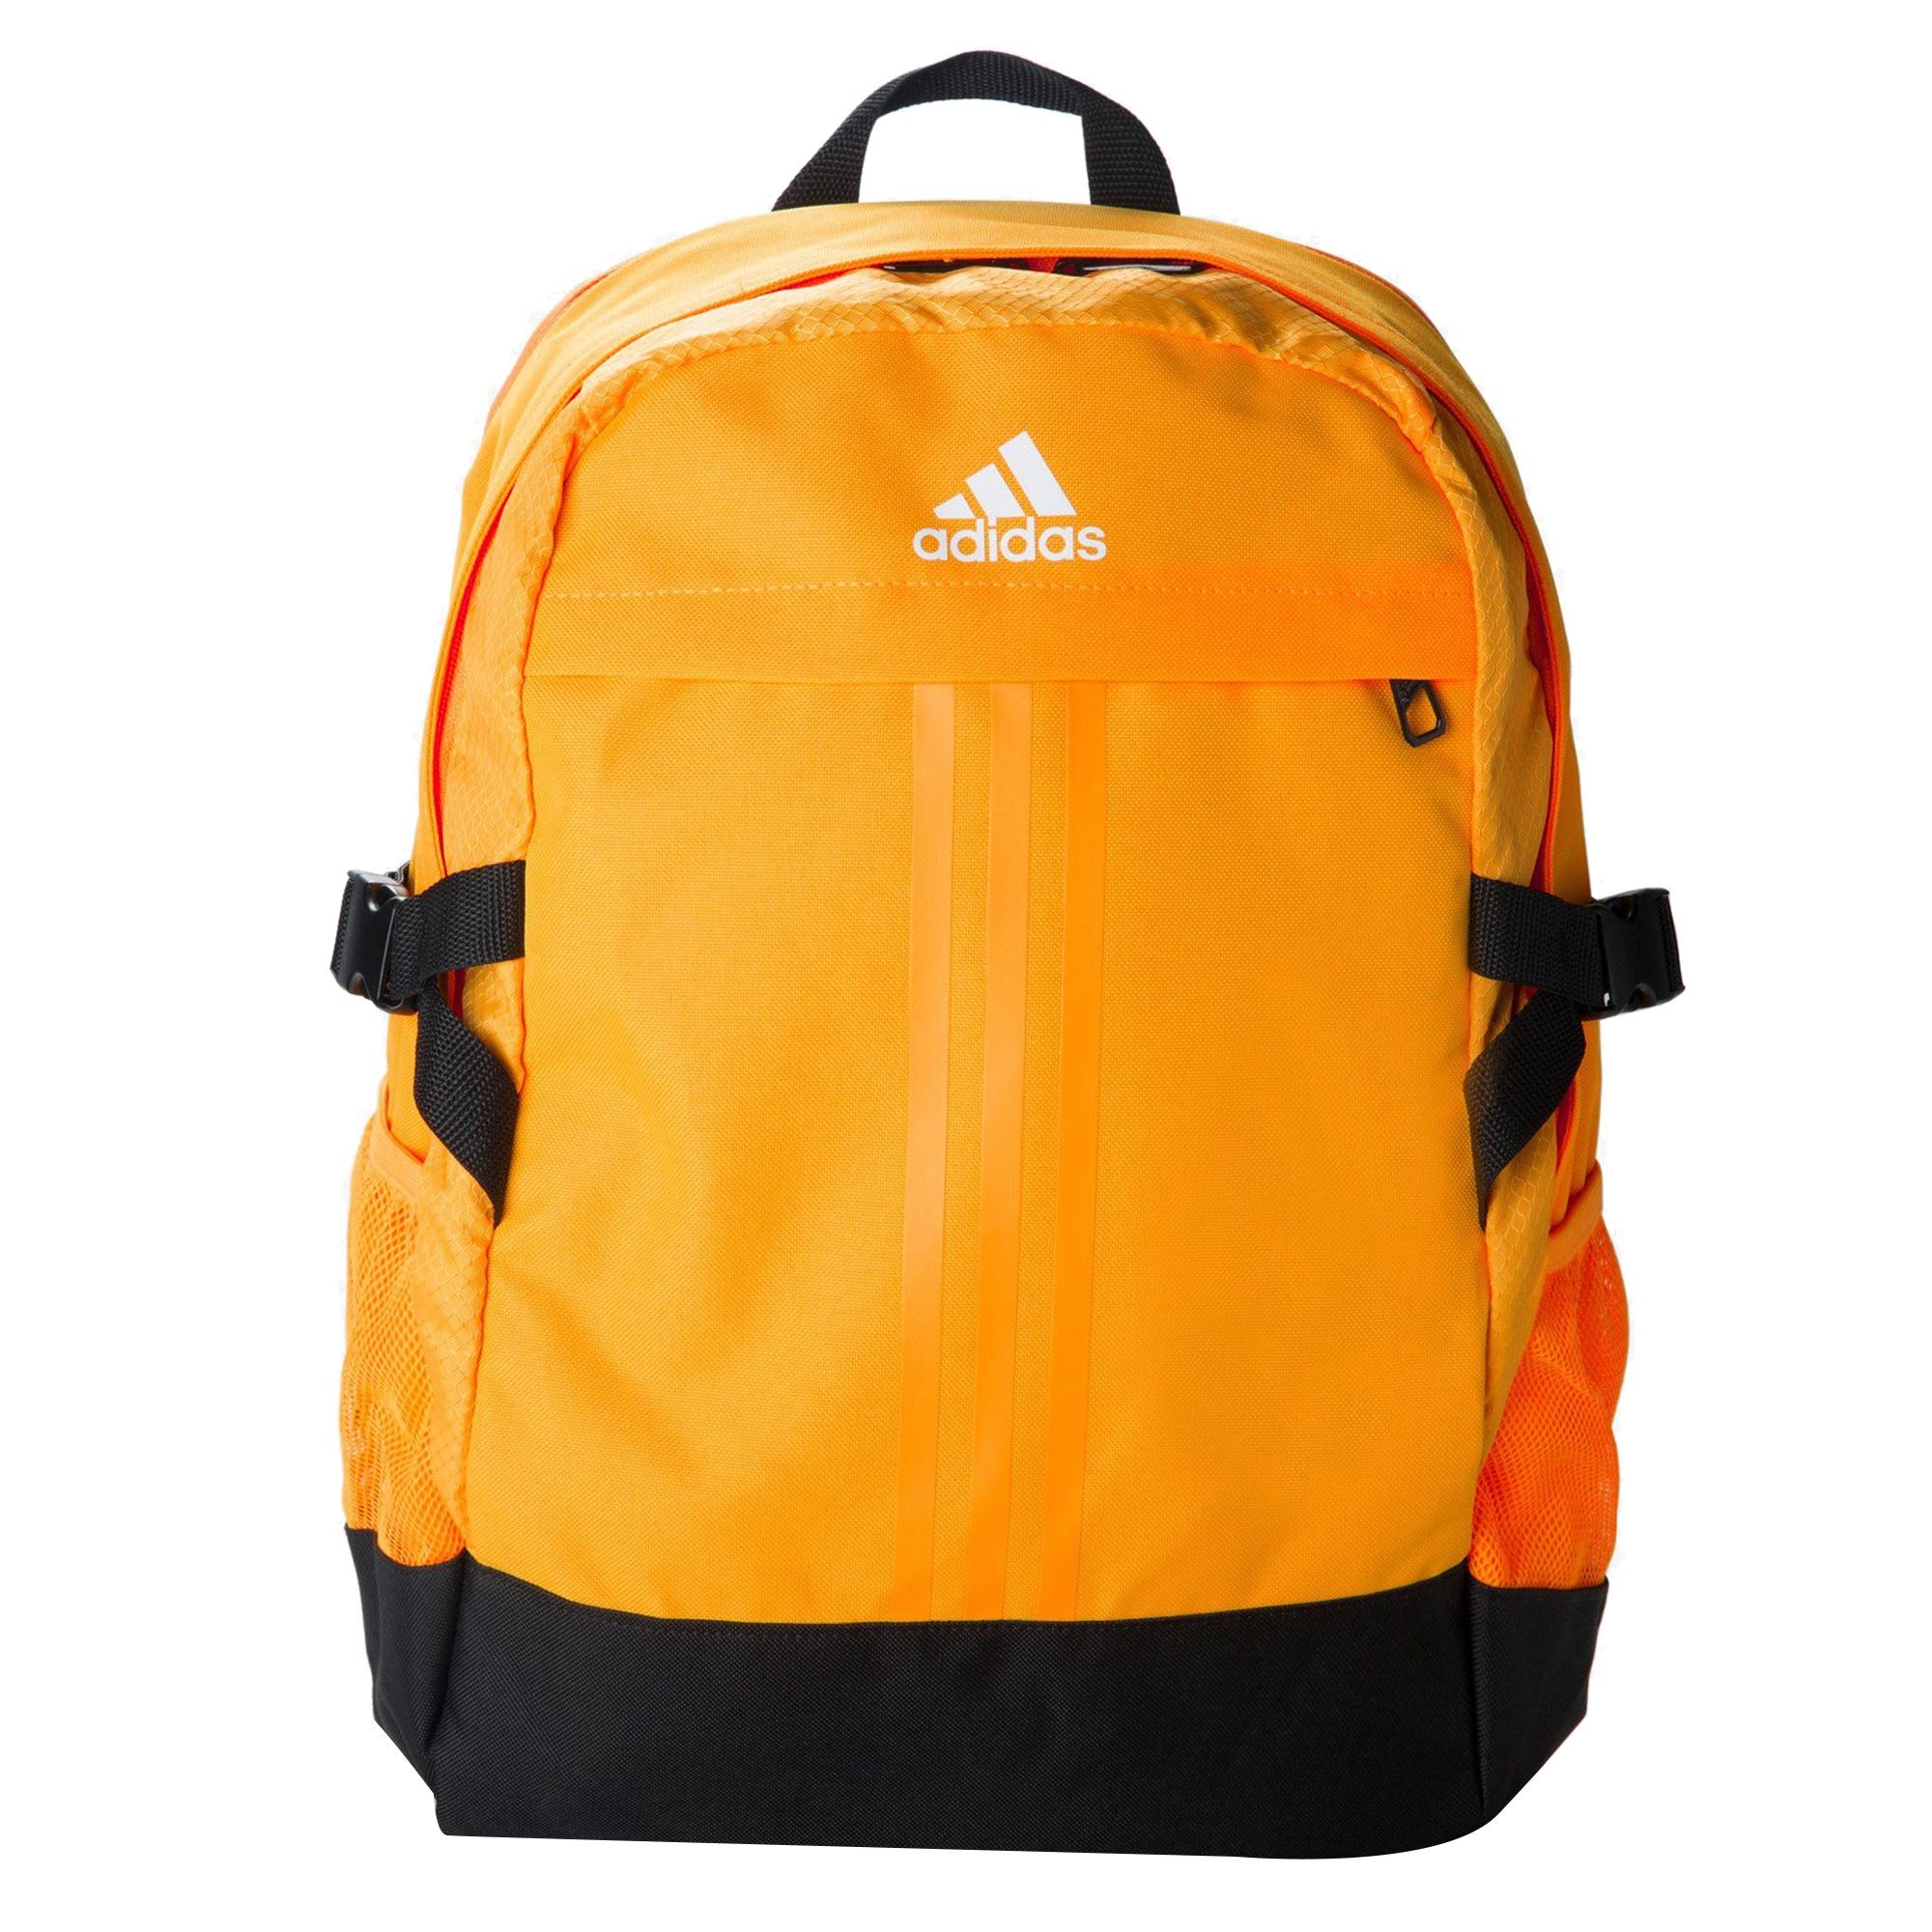 077bfcd268ad3 adidas Power III M Backpack FW16 Sırt Çantası  AY5090 - Barcin.com